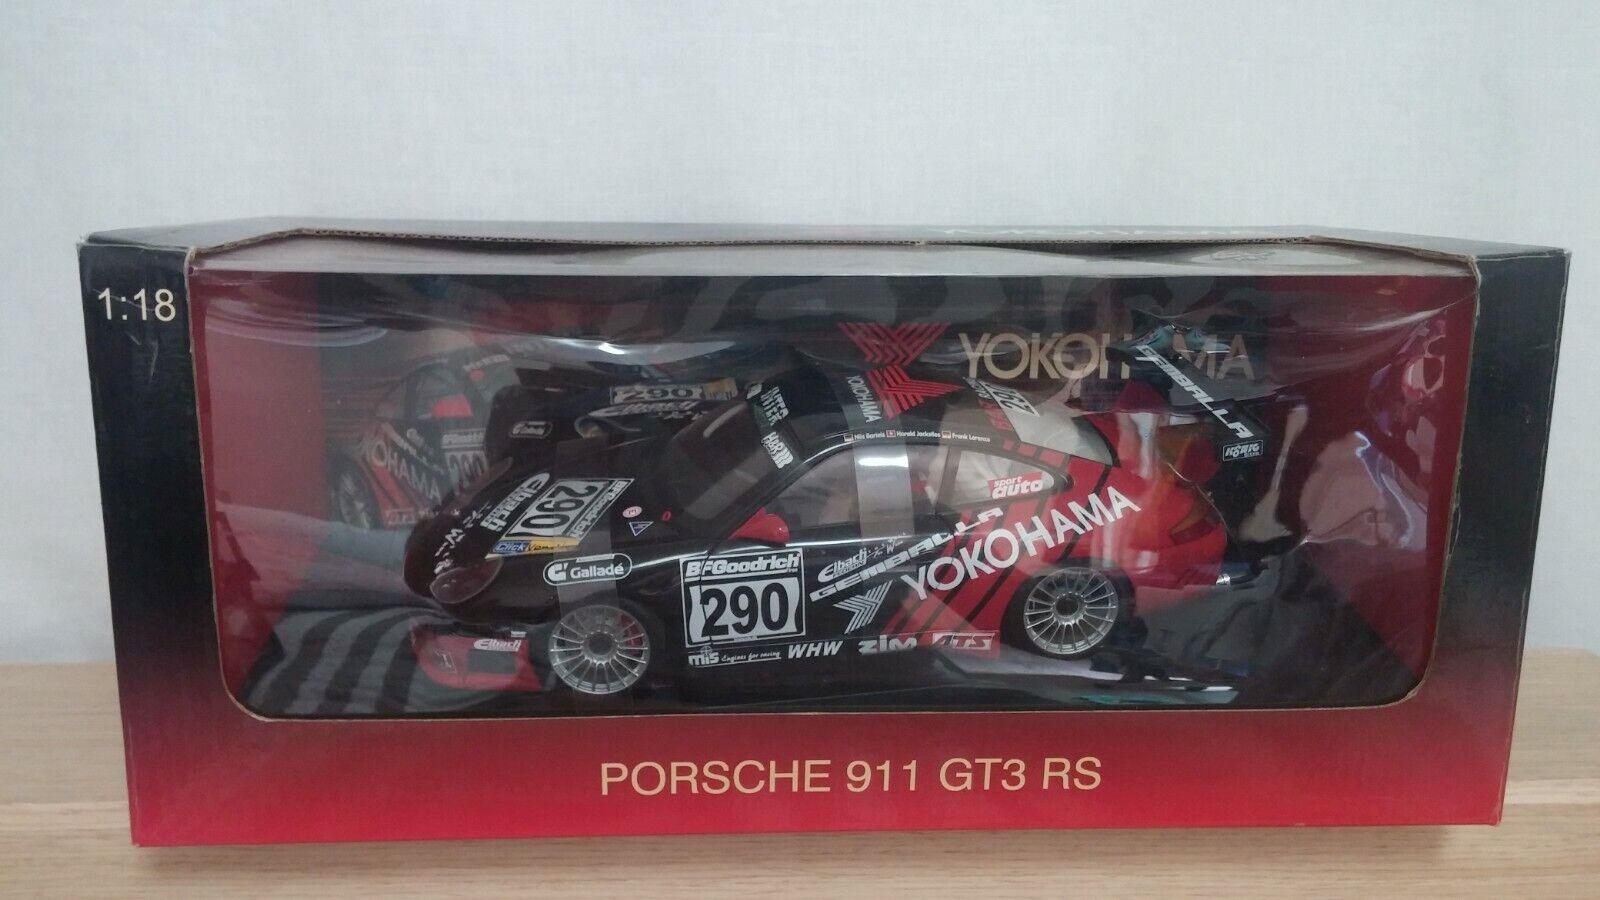 1 18 Autoart Porsche 911 996 GT3 RS YOKOHAMA